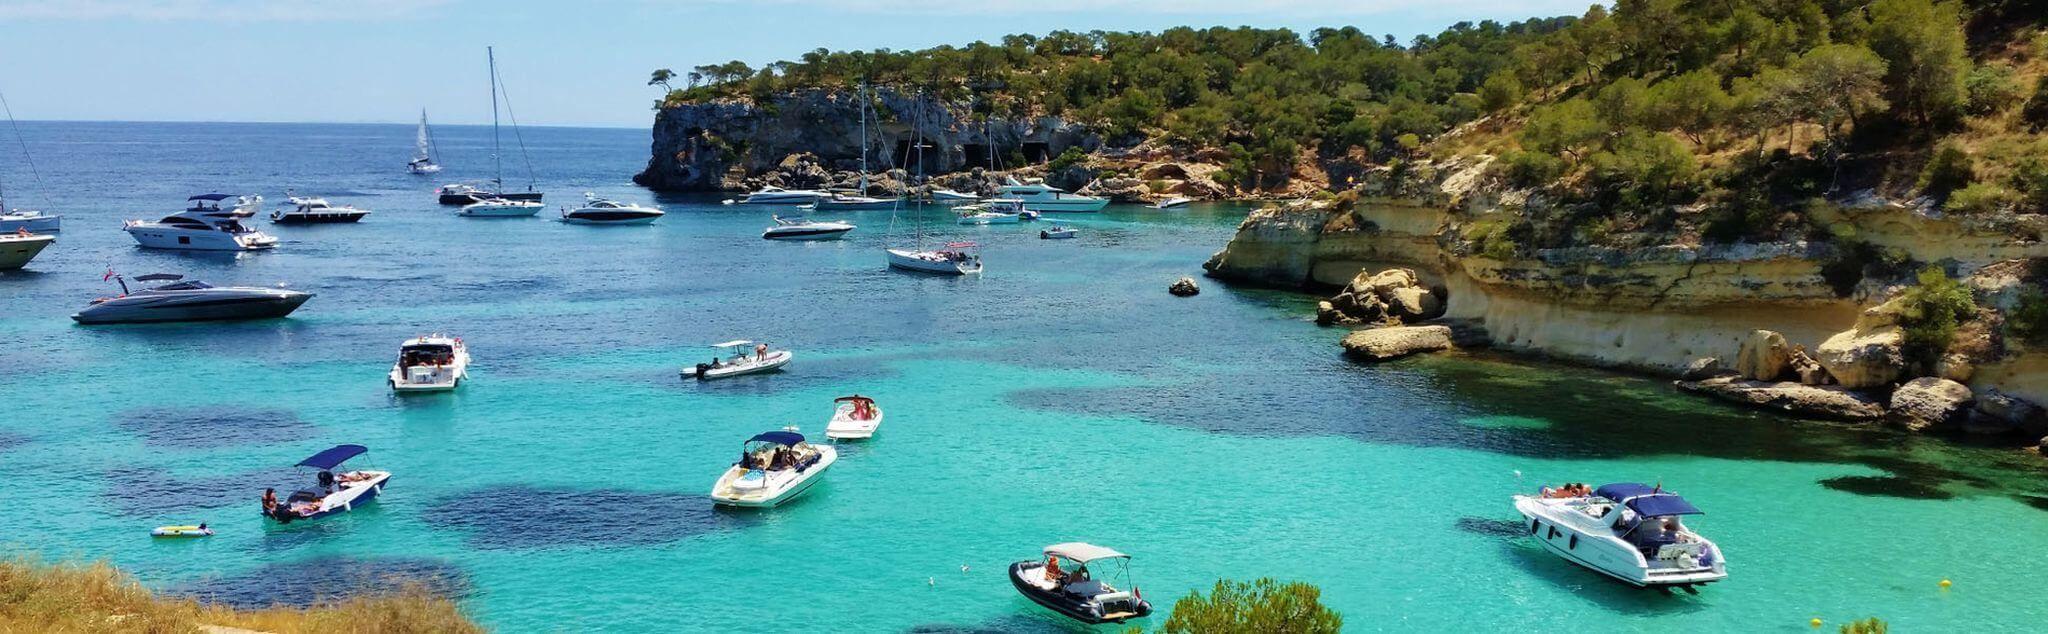 Segway in Islas Baleares